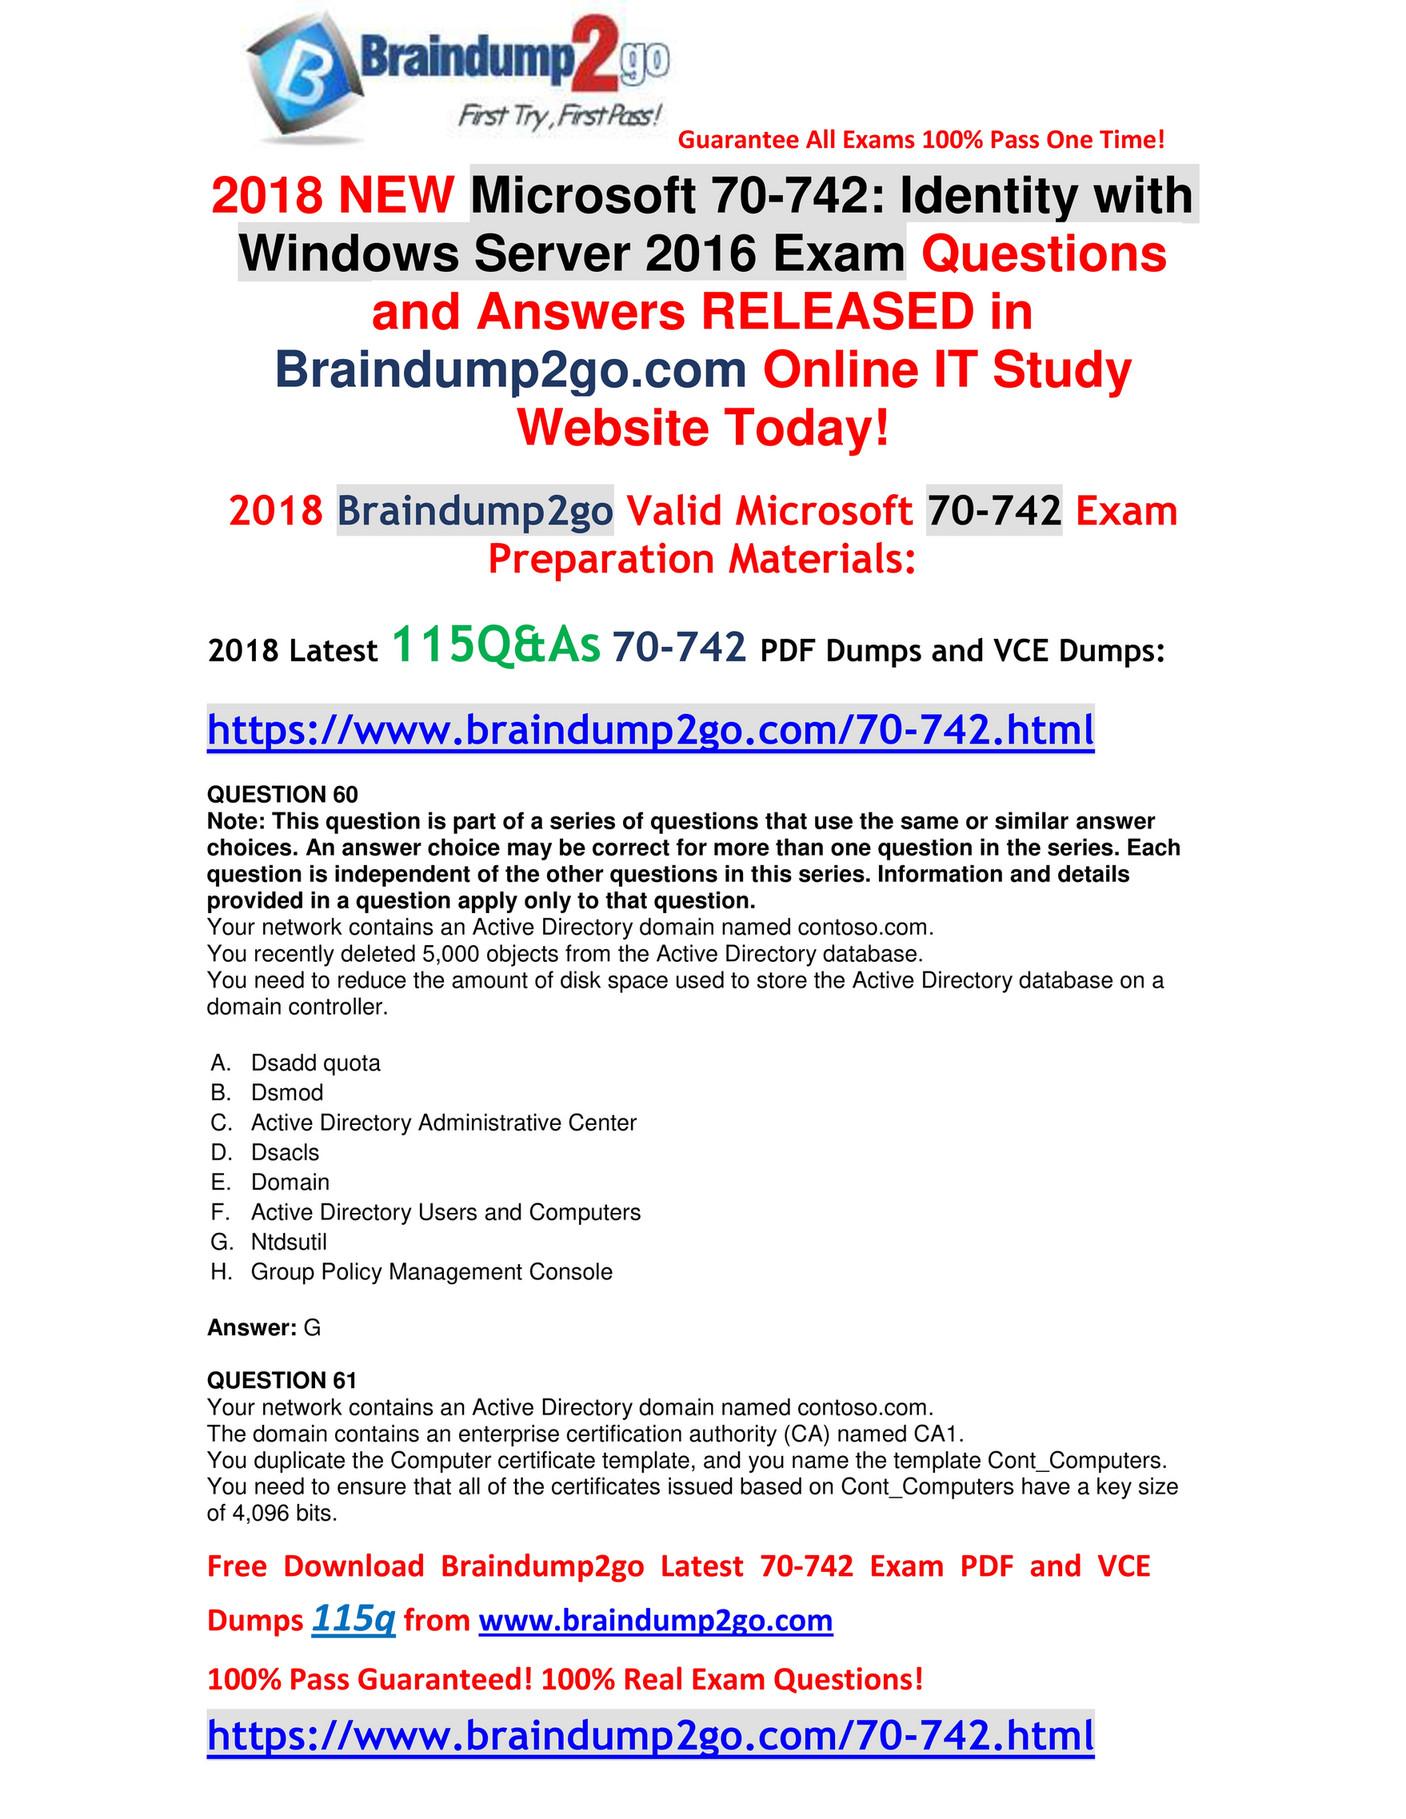 My publications - [Free-Version]2018 Braindump2go New 70-742 Dumps